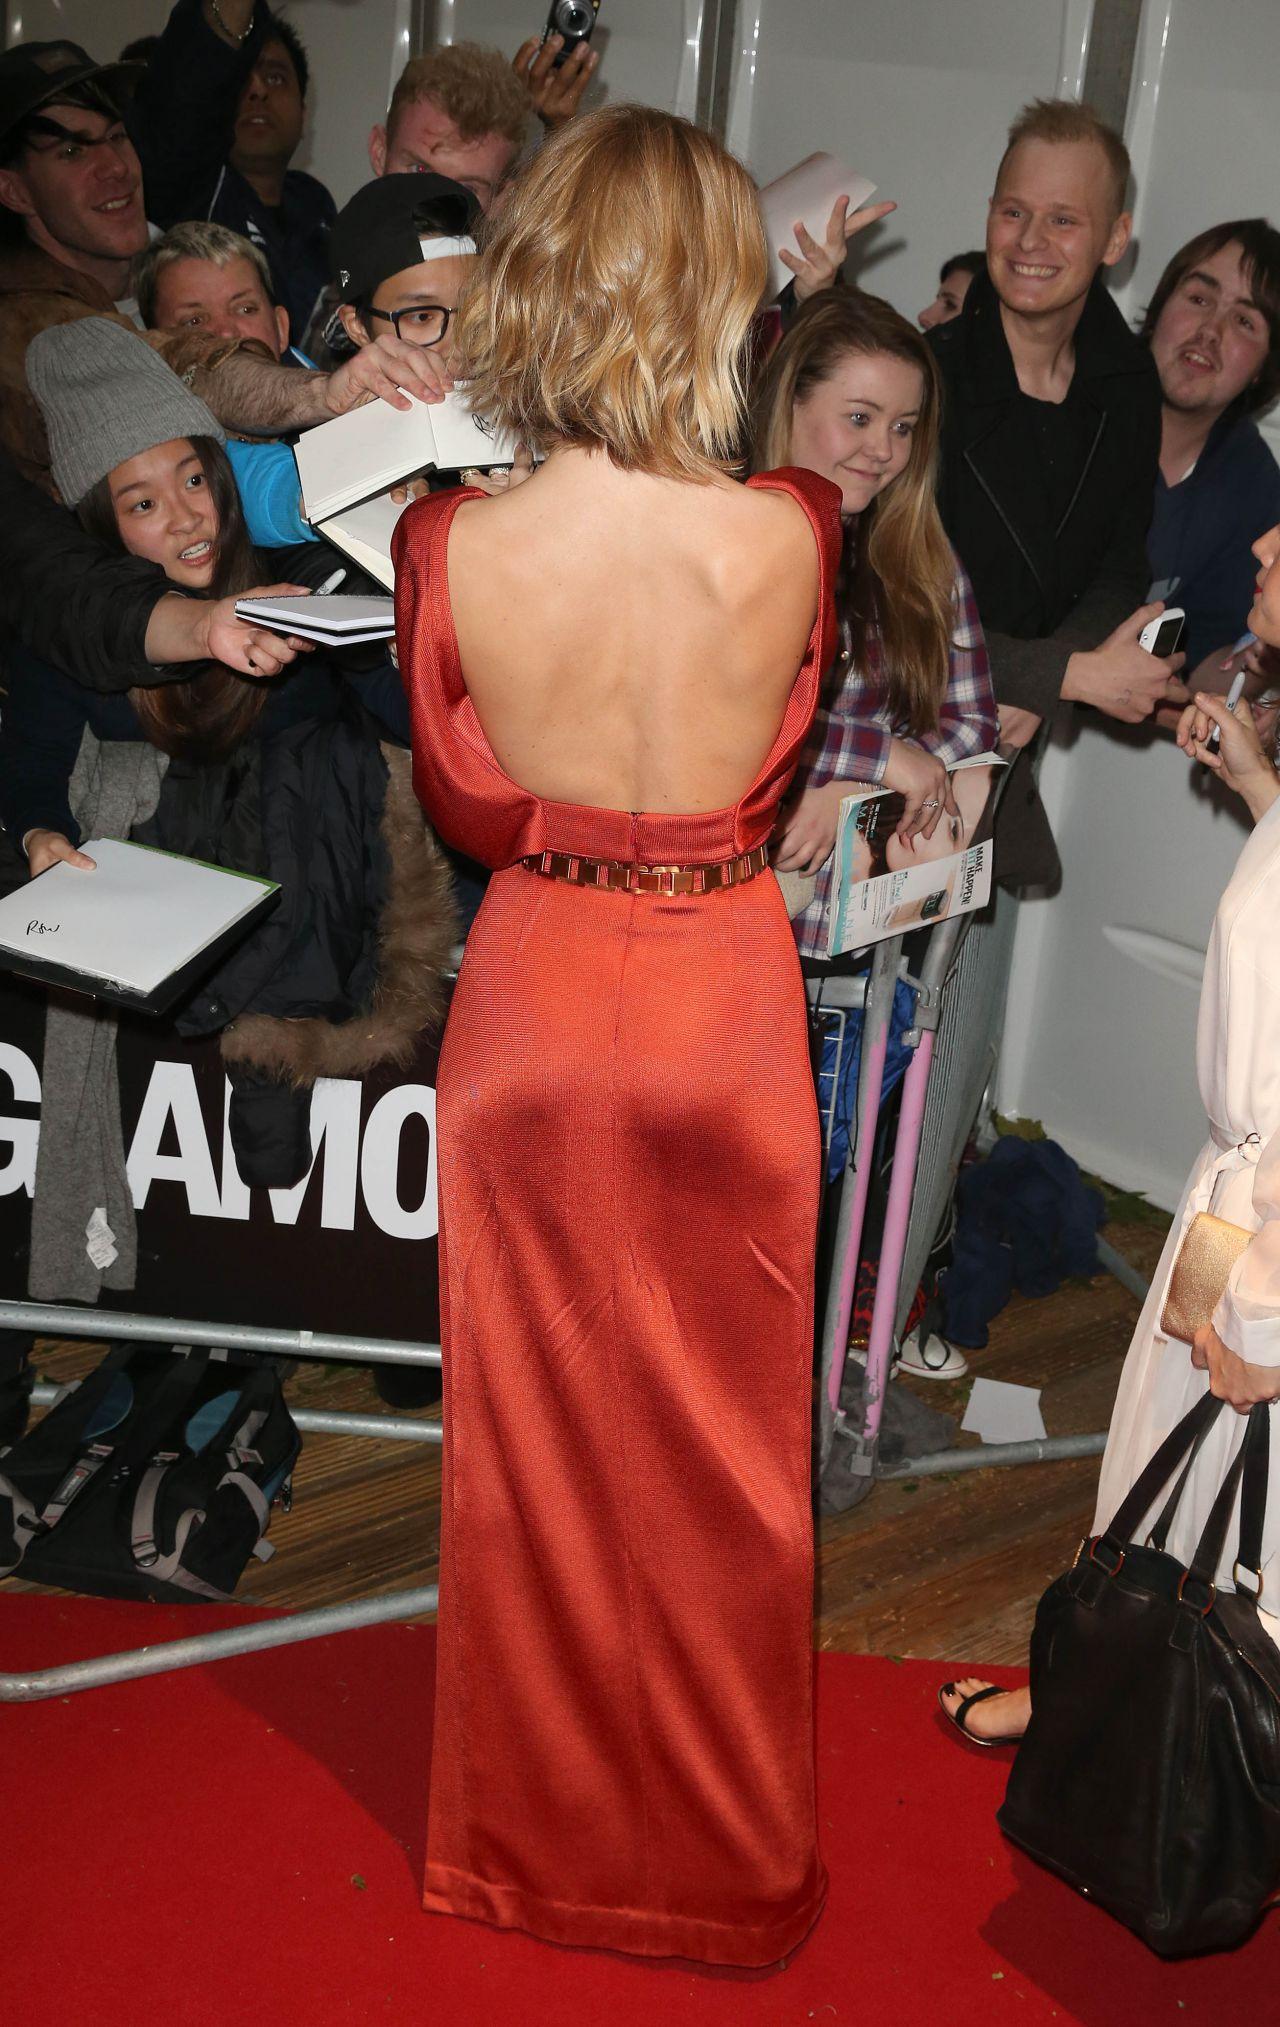 rosie-huntington-whiteley-in-cushnie-et-ochs-2015-glamour-woman-of-the-year-awards